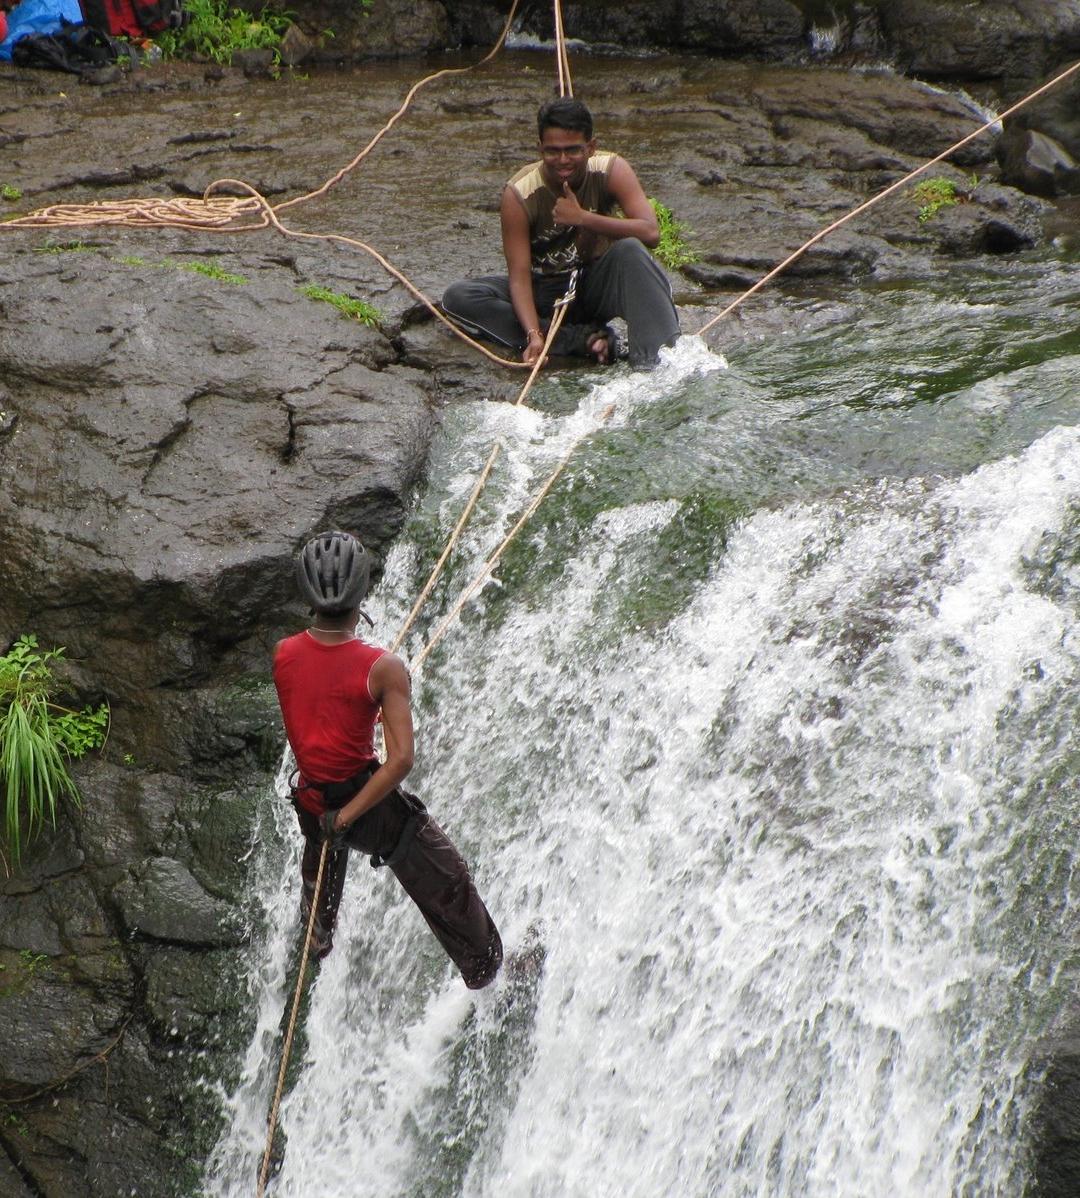 Karjat Resort Near Waterfall Waterfall Rappelling at Karjat